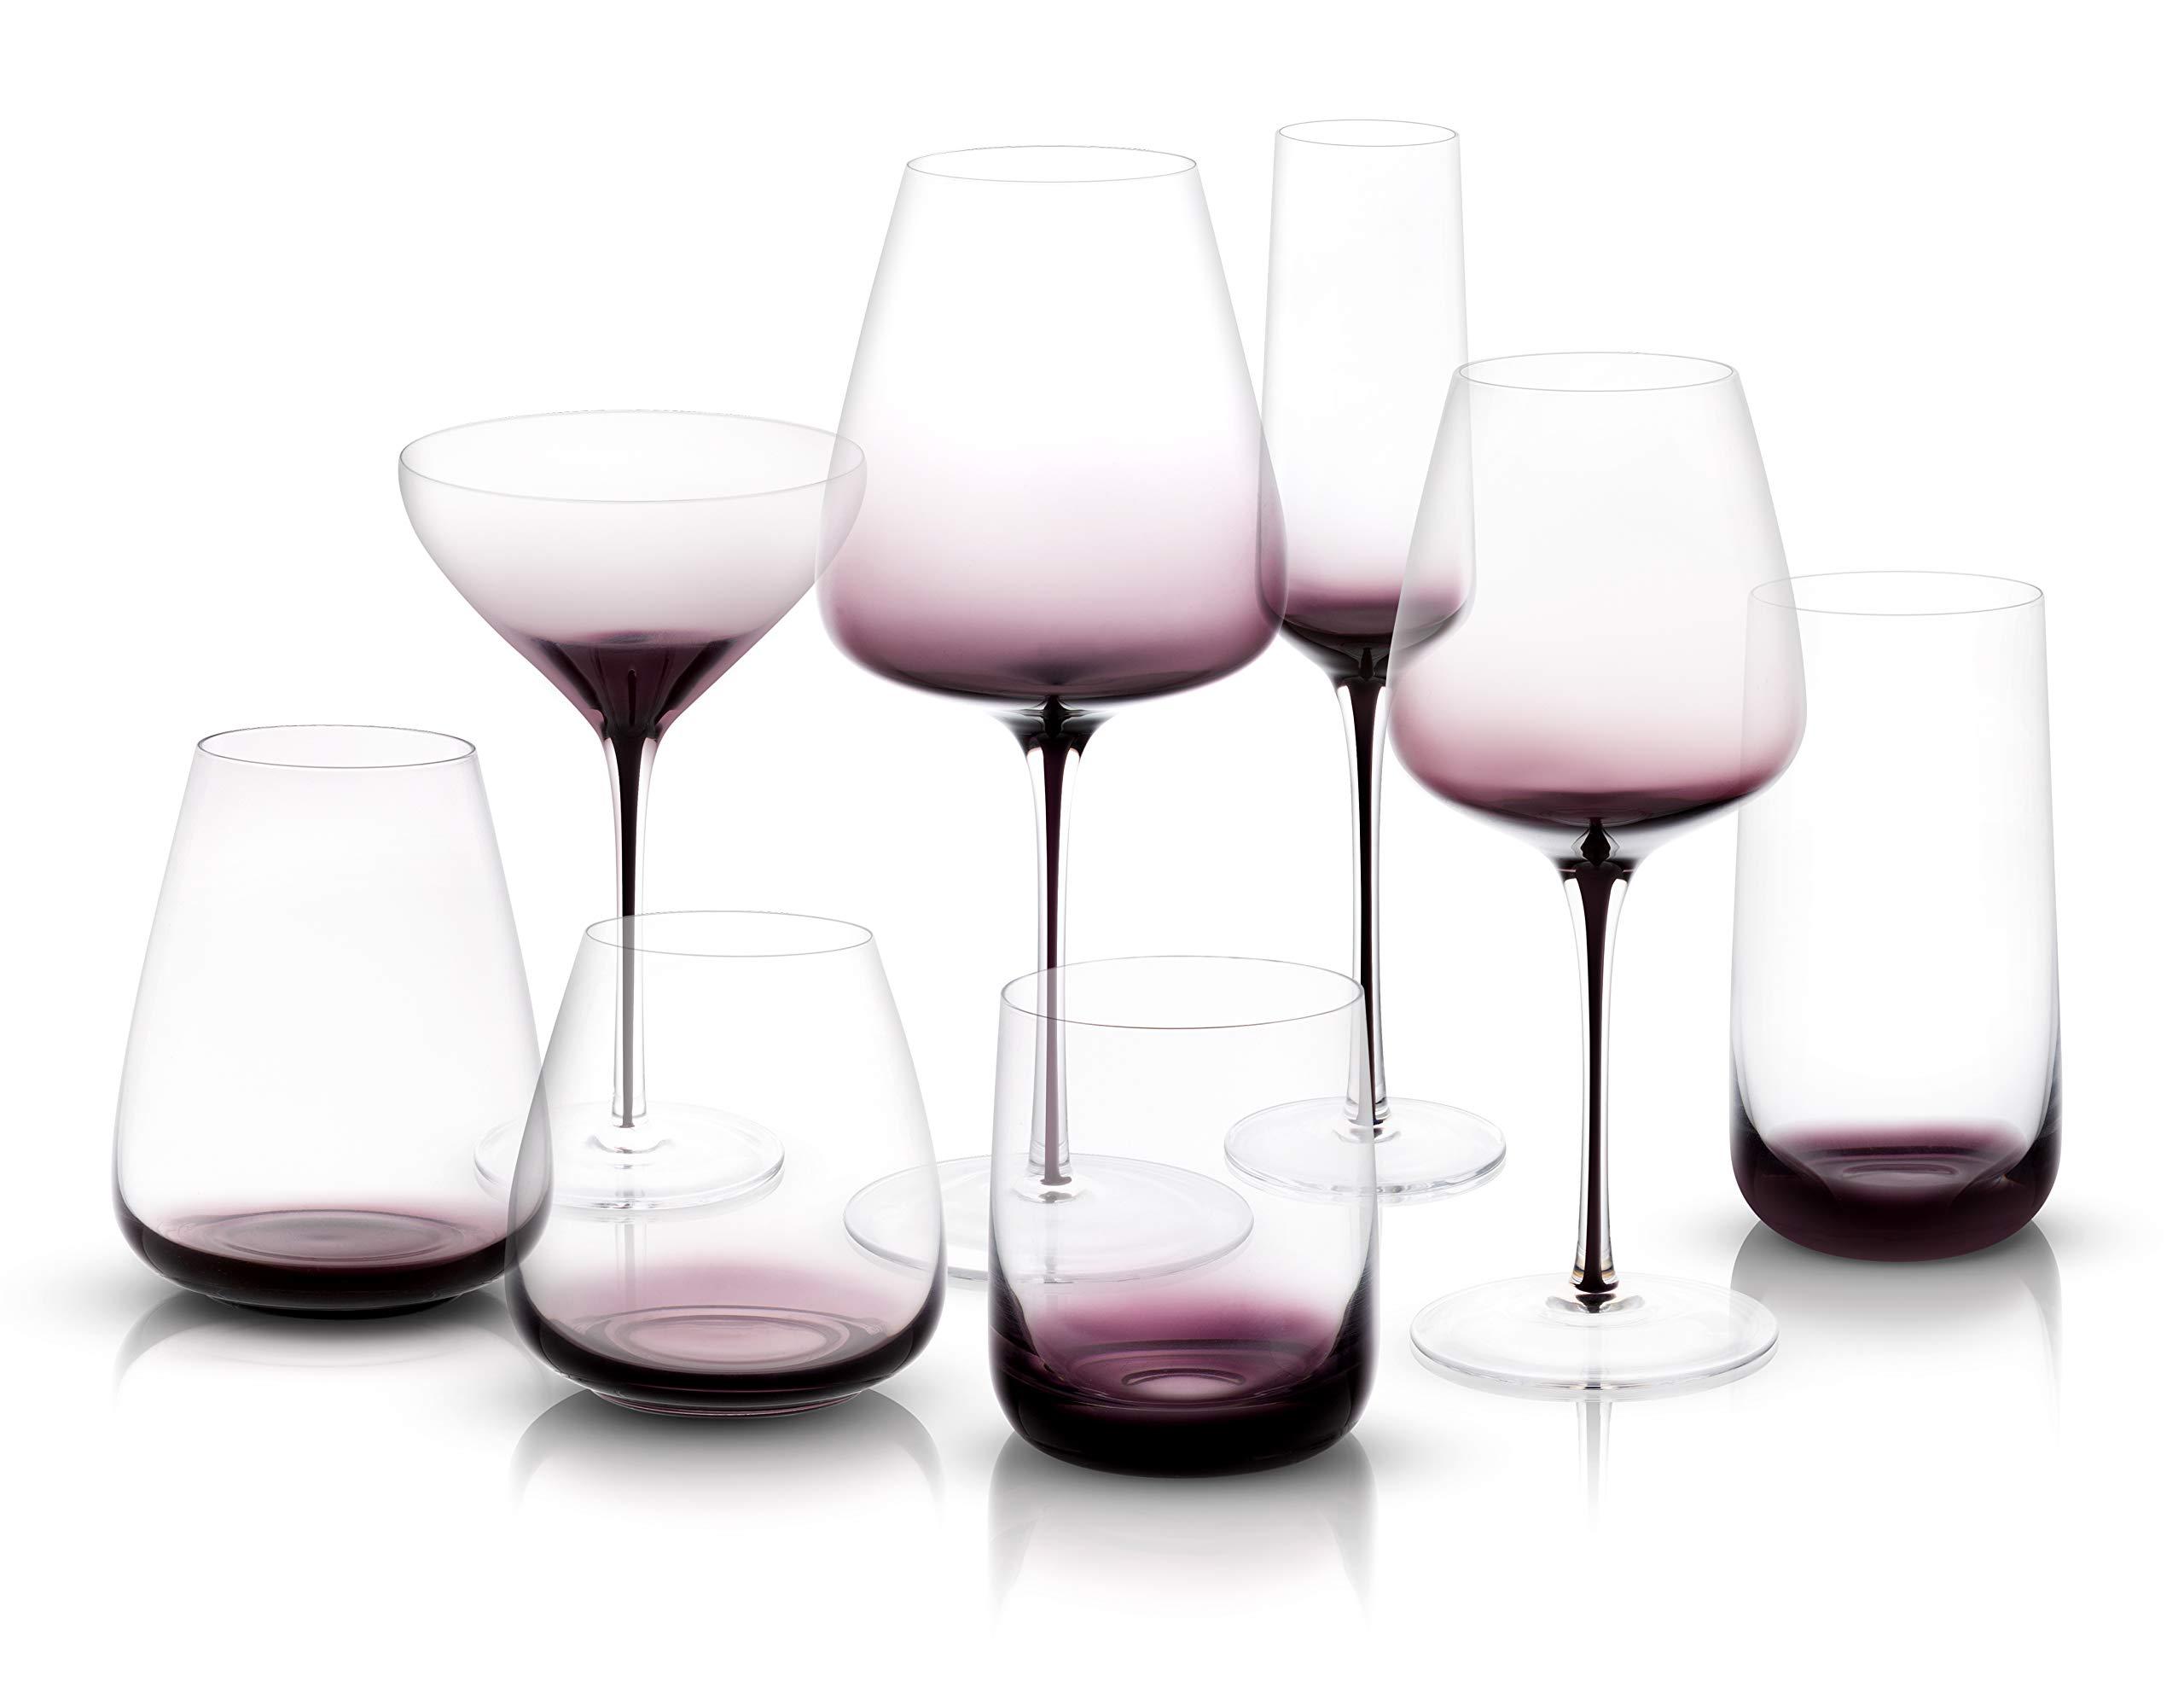 JoyJolt Black Swan Collection Glassware (Full Collection Set Of 16)